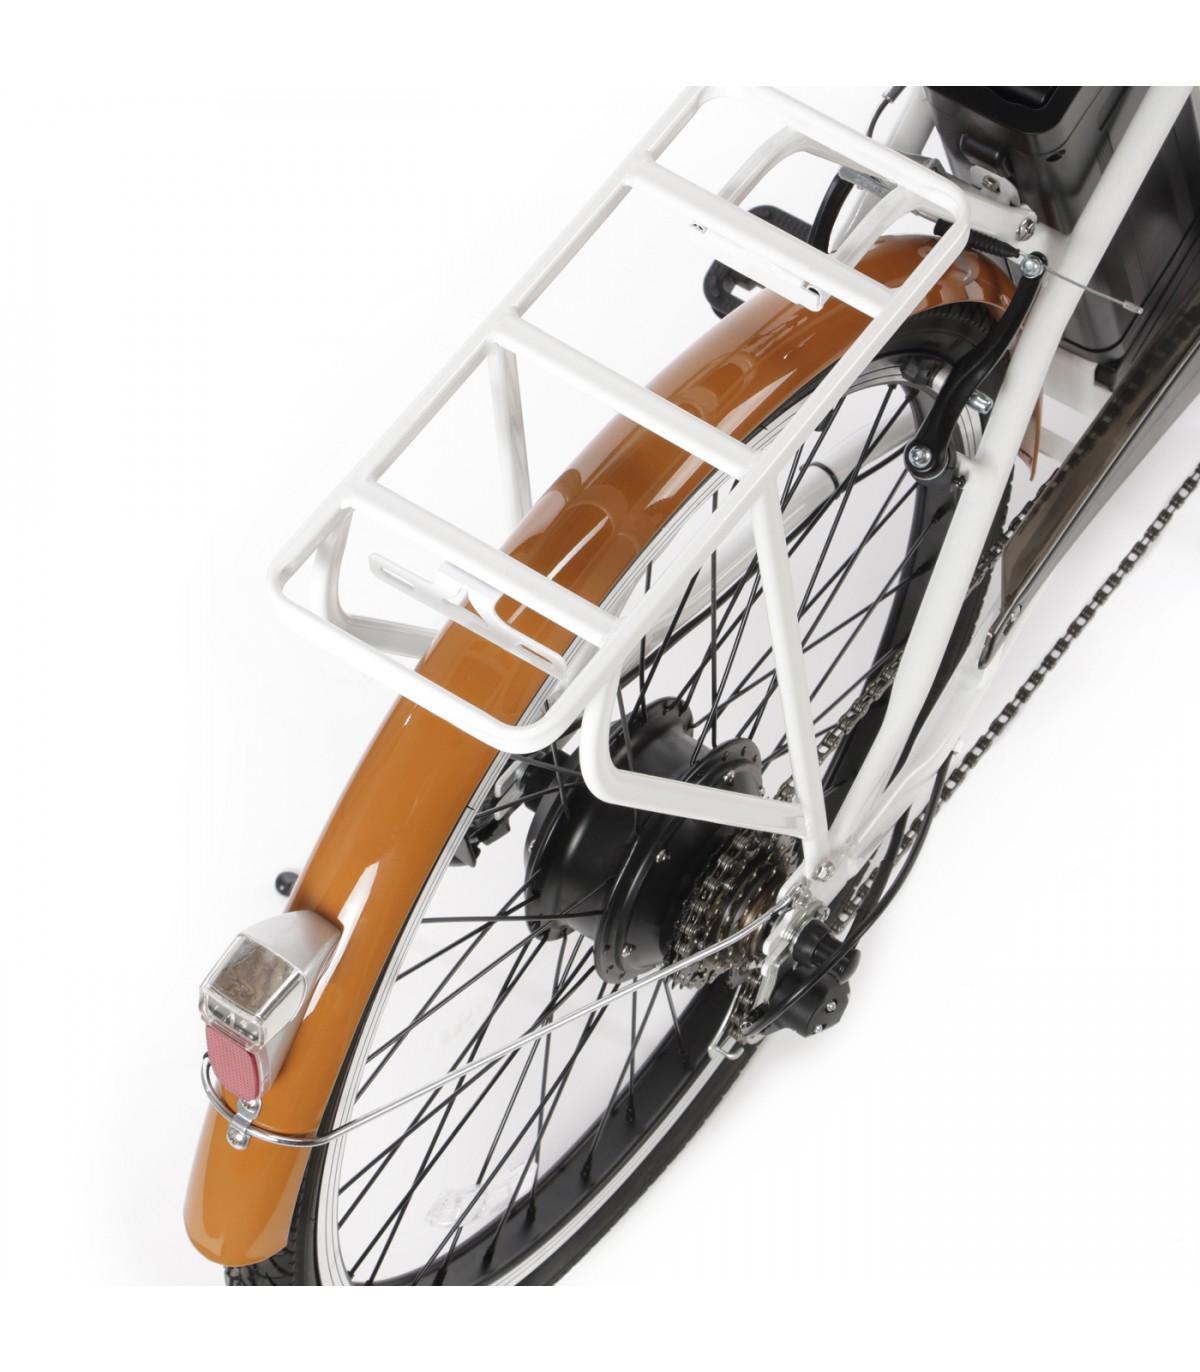 bicicleta-electrica-gante-blanca (20).jpg